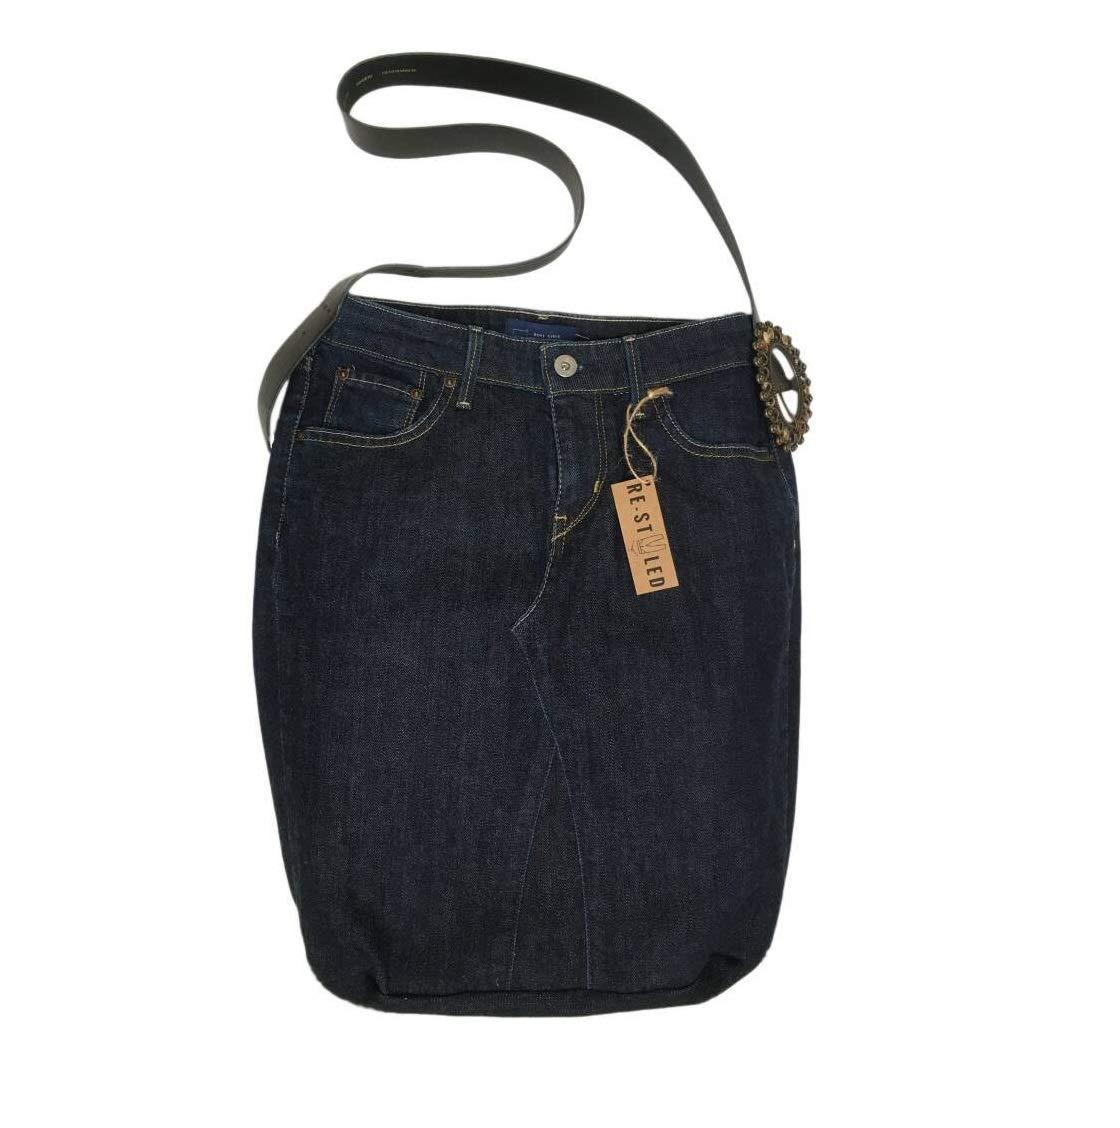 Handmade Jeans Bag, Denim Hobo Shoulder Bag, Recycled Denim Jeans Crossbody Bag, Handmade Craft Bag, Denim Style, Restyled Handbag, Dark Blue - handmade-bags